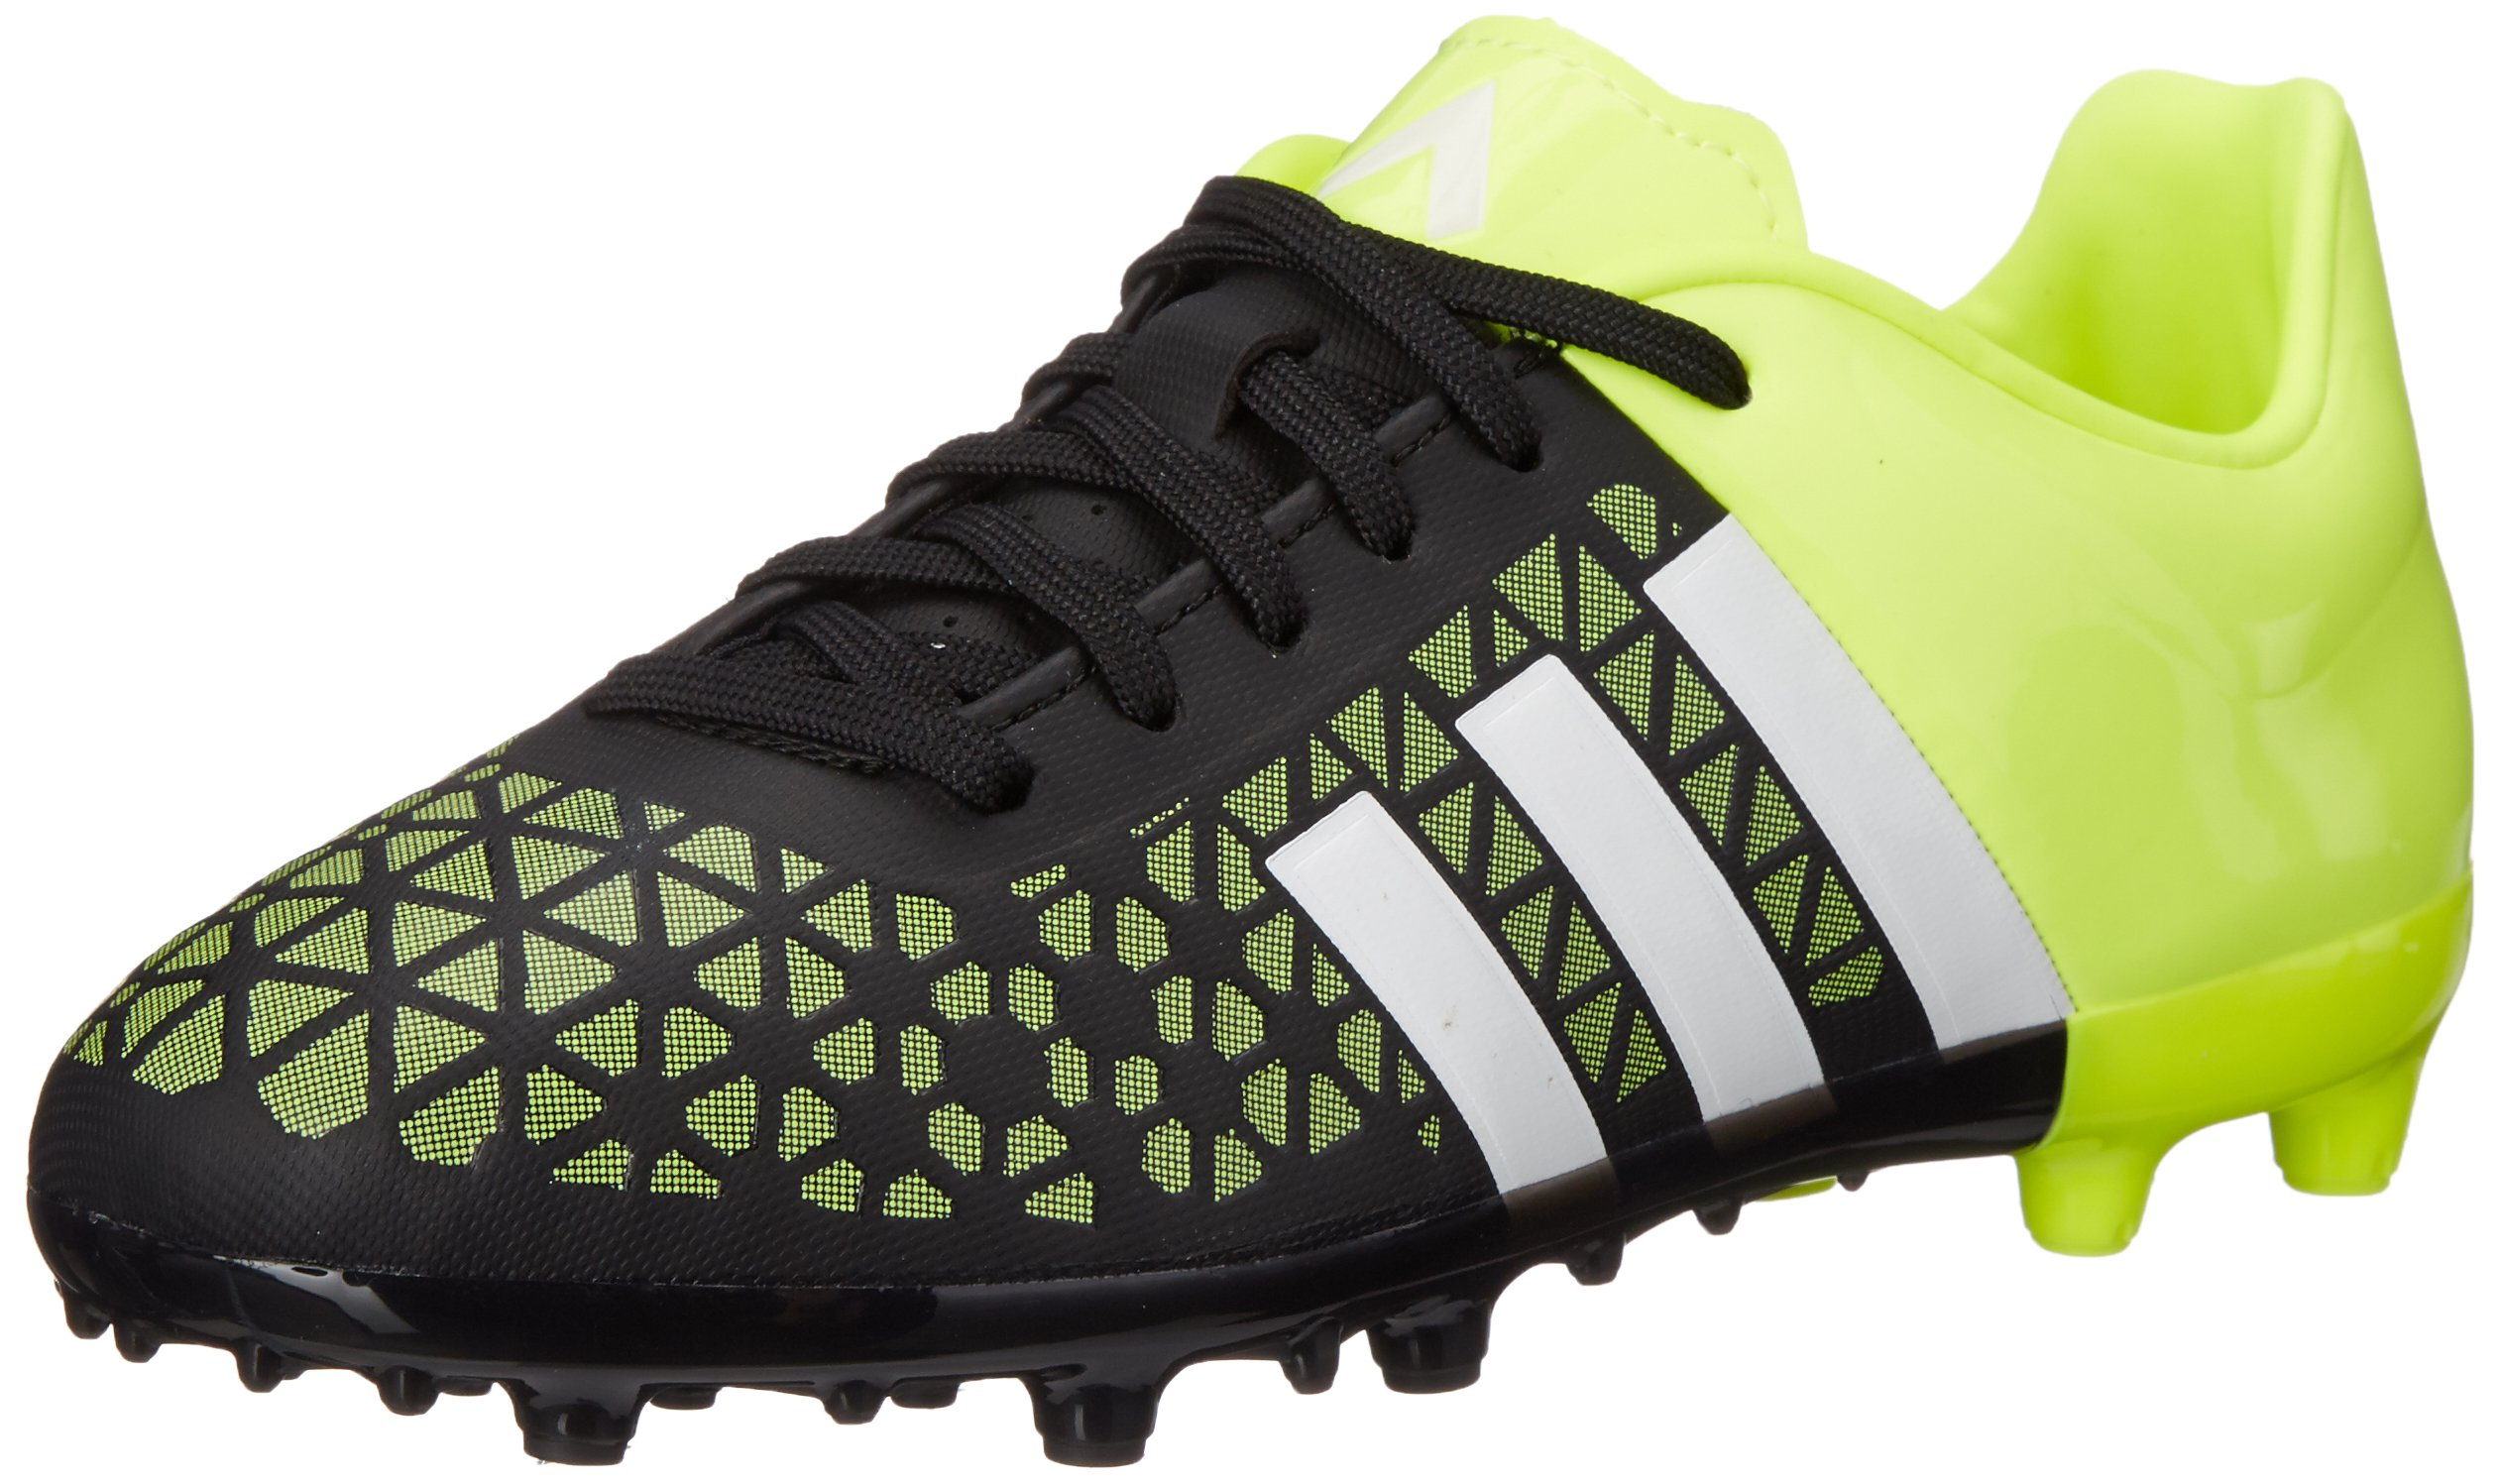 finest selection 0c996 a4e1e Amazon.com   adidas Performance Ace 15.3 FG AG J Soccer Shoe (Little  Kid Big Kid)   Soccer